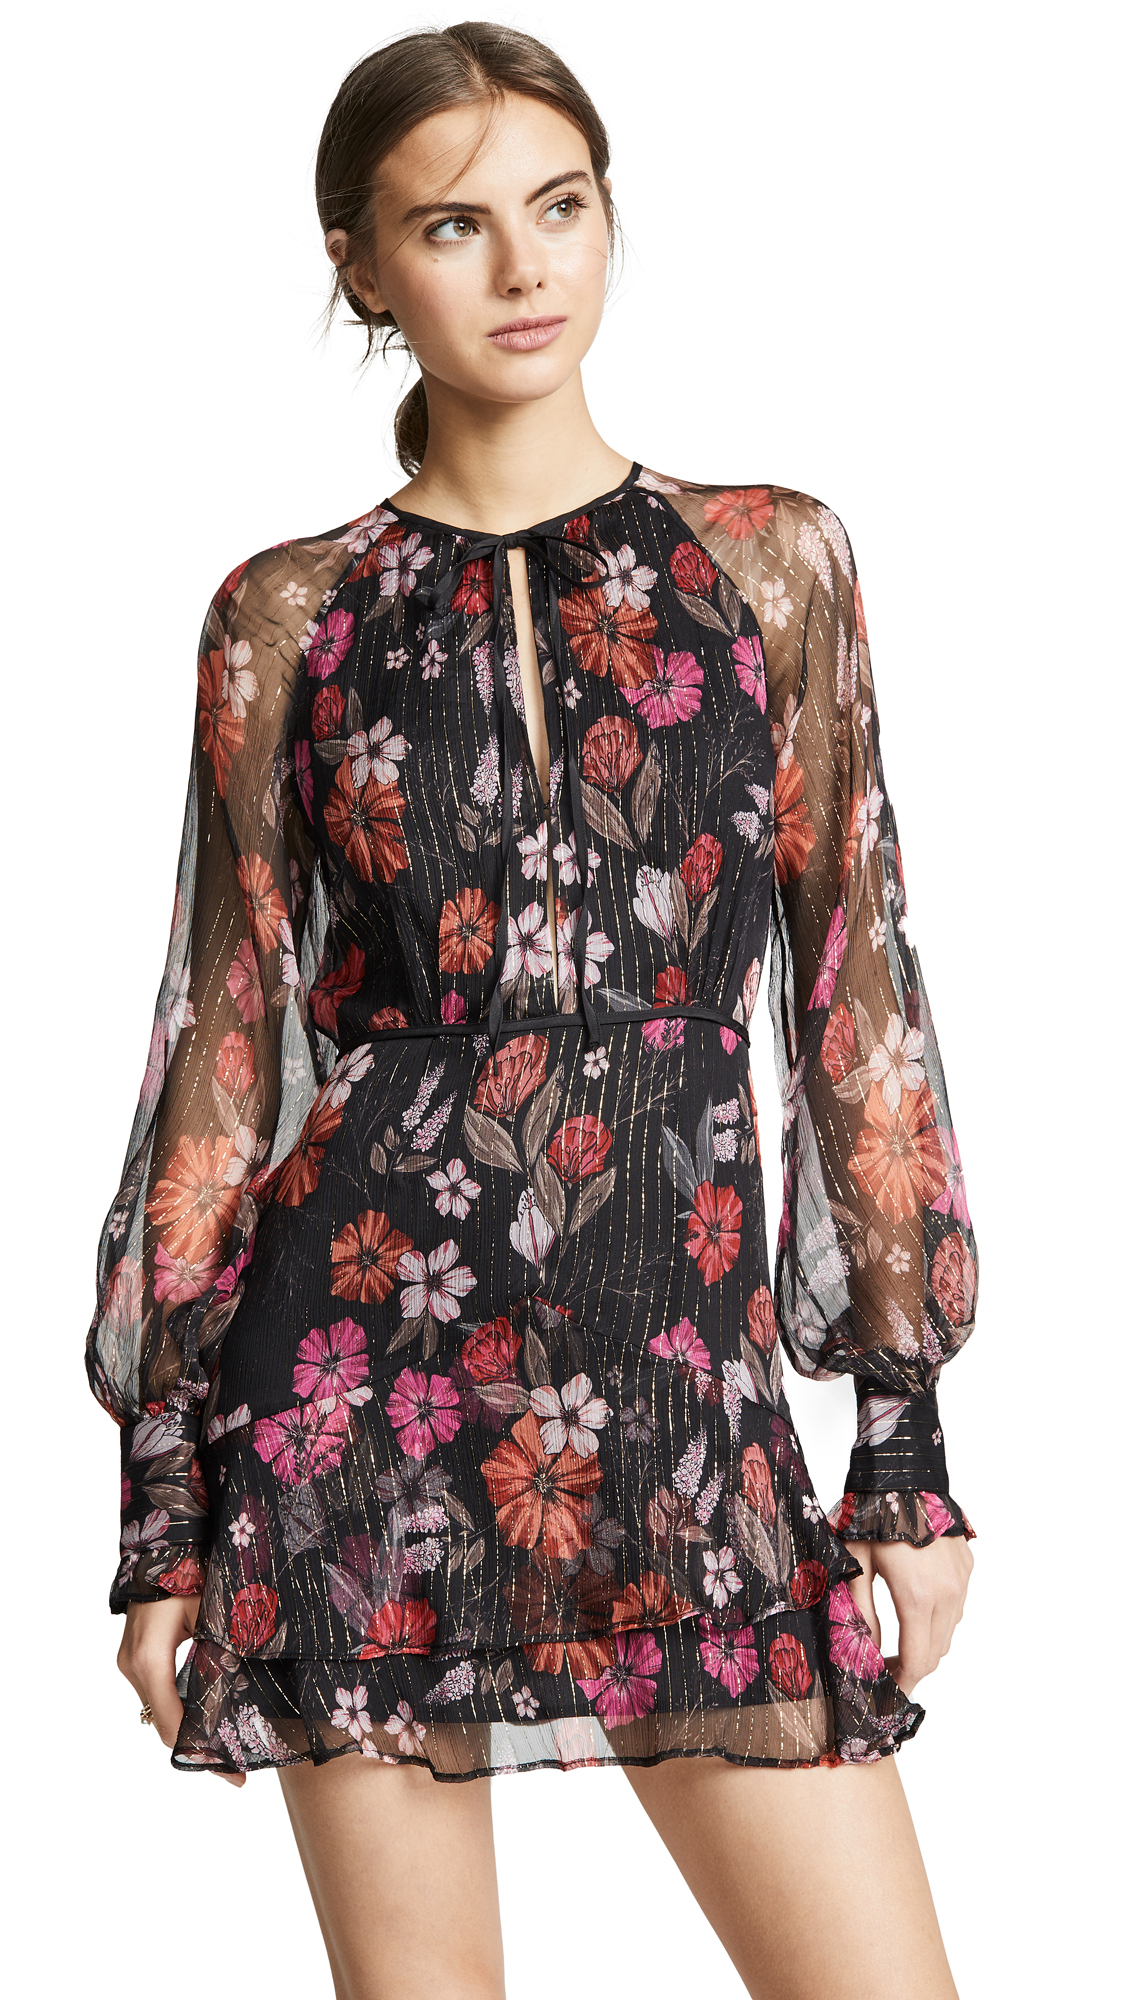 La Maison Talulah Wild Bloom Long Sleeve Mini Dress in Winter Floral Print